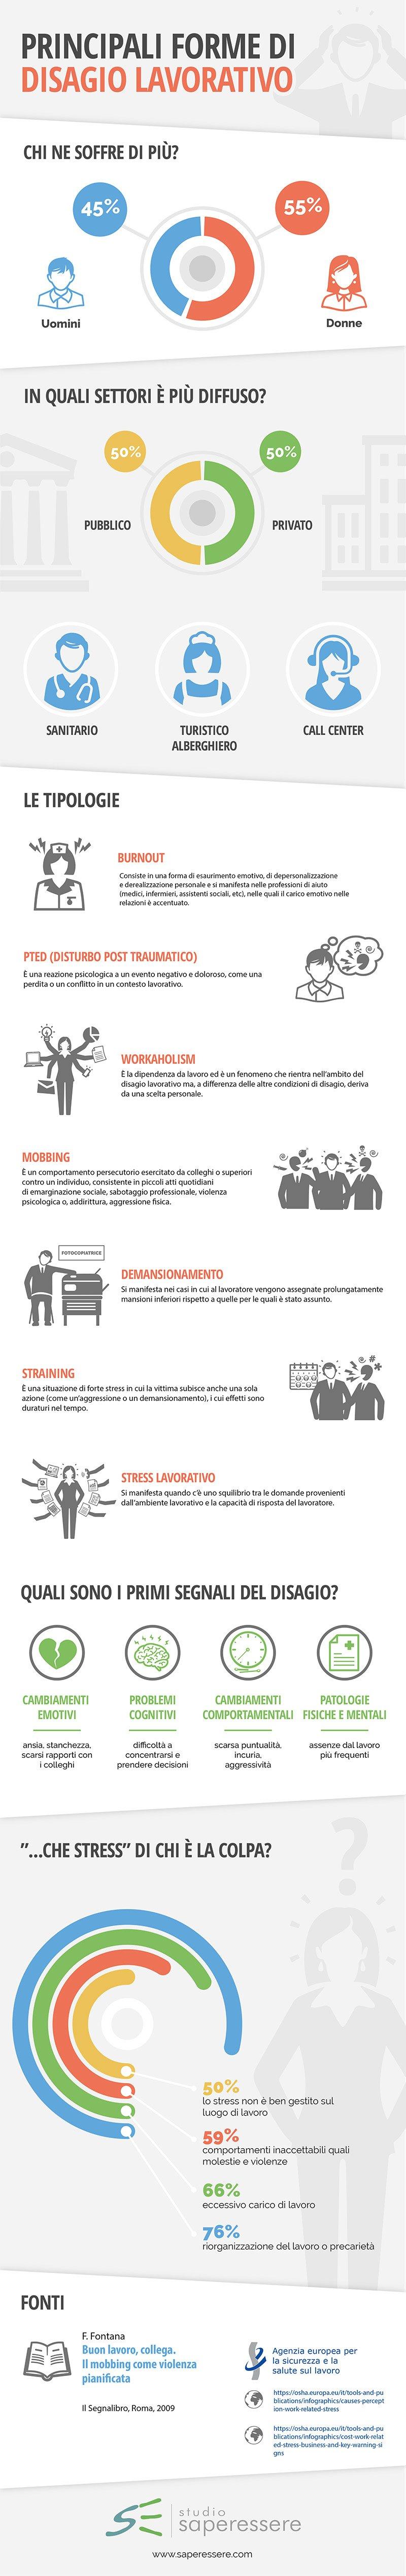 Infografica disagio lavorativo